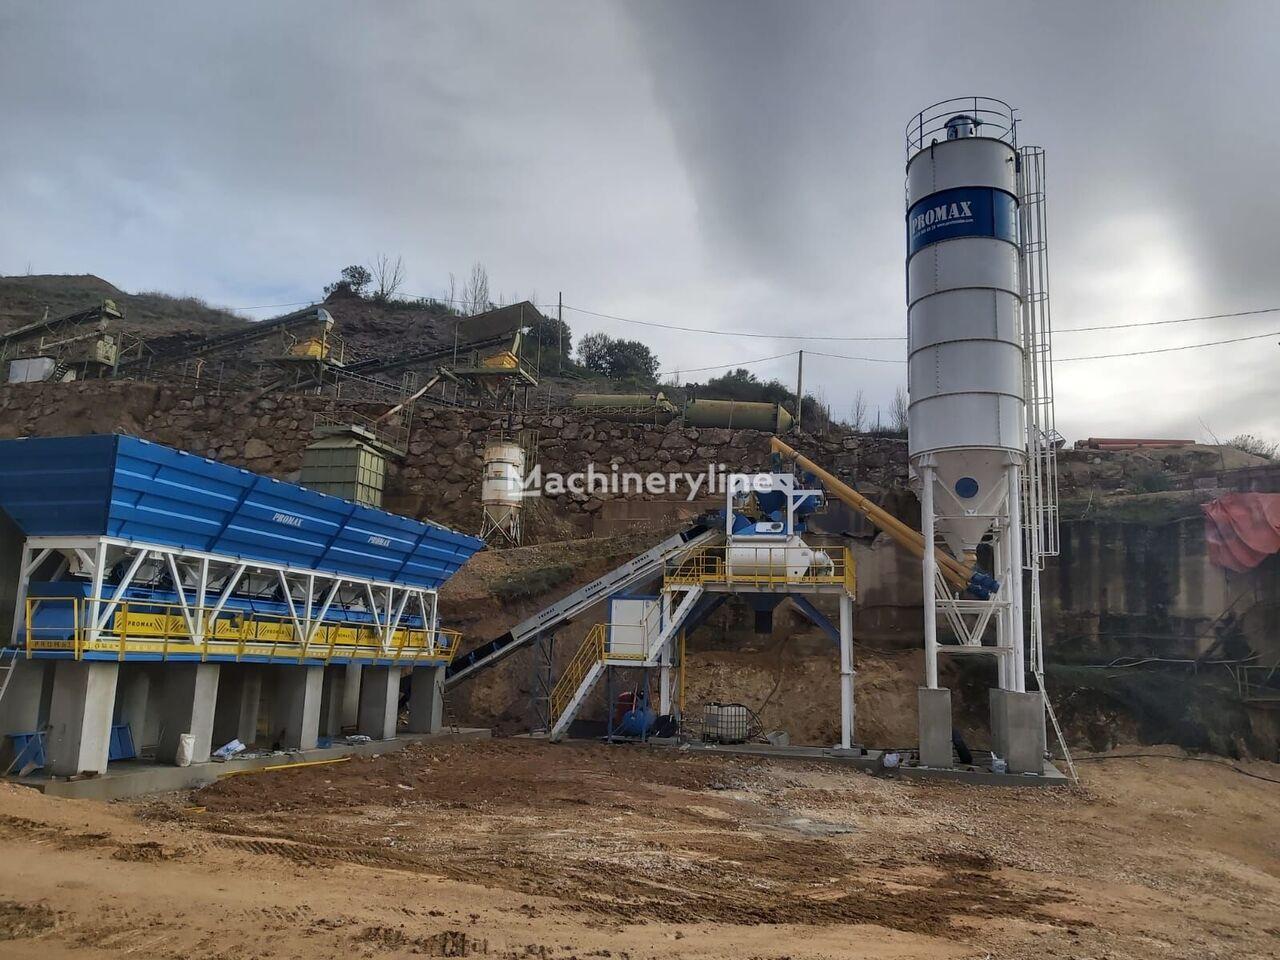 PROMAX Planta de hormigón Compacta C100-TWN LINE(100m³ / h) planta de hormigón nueva